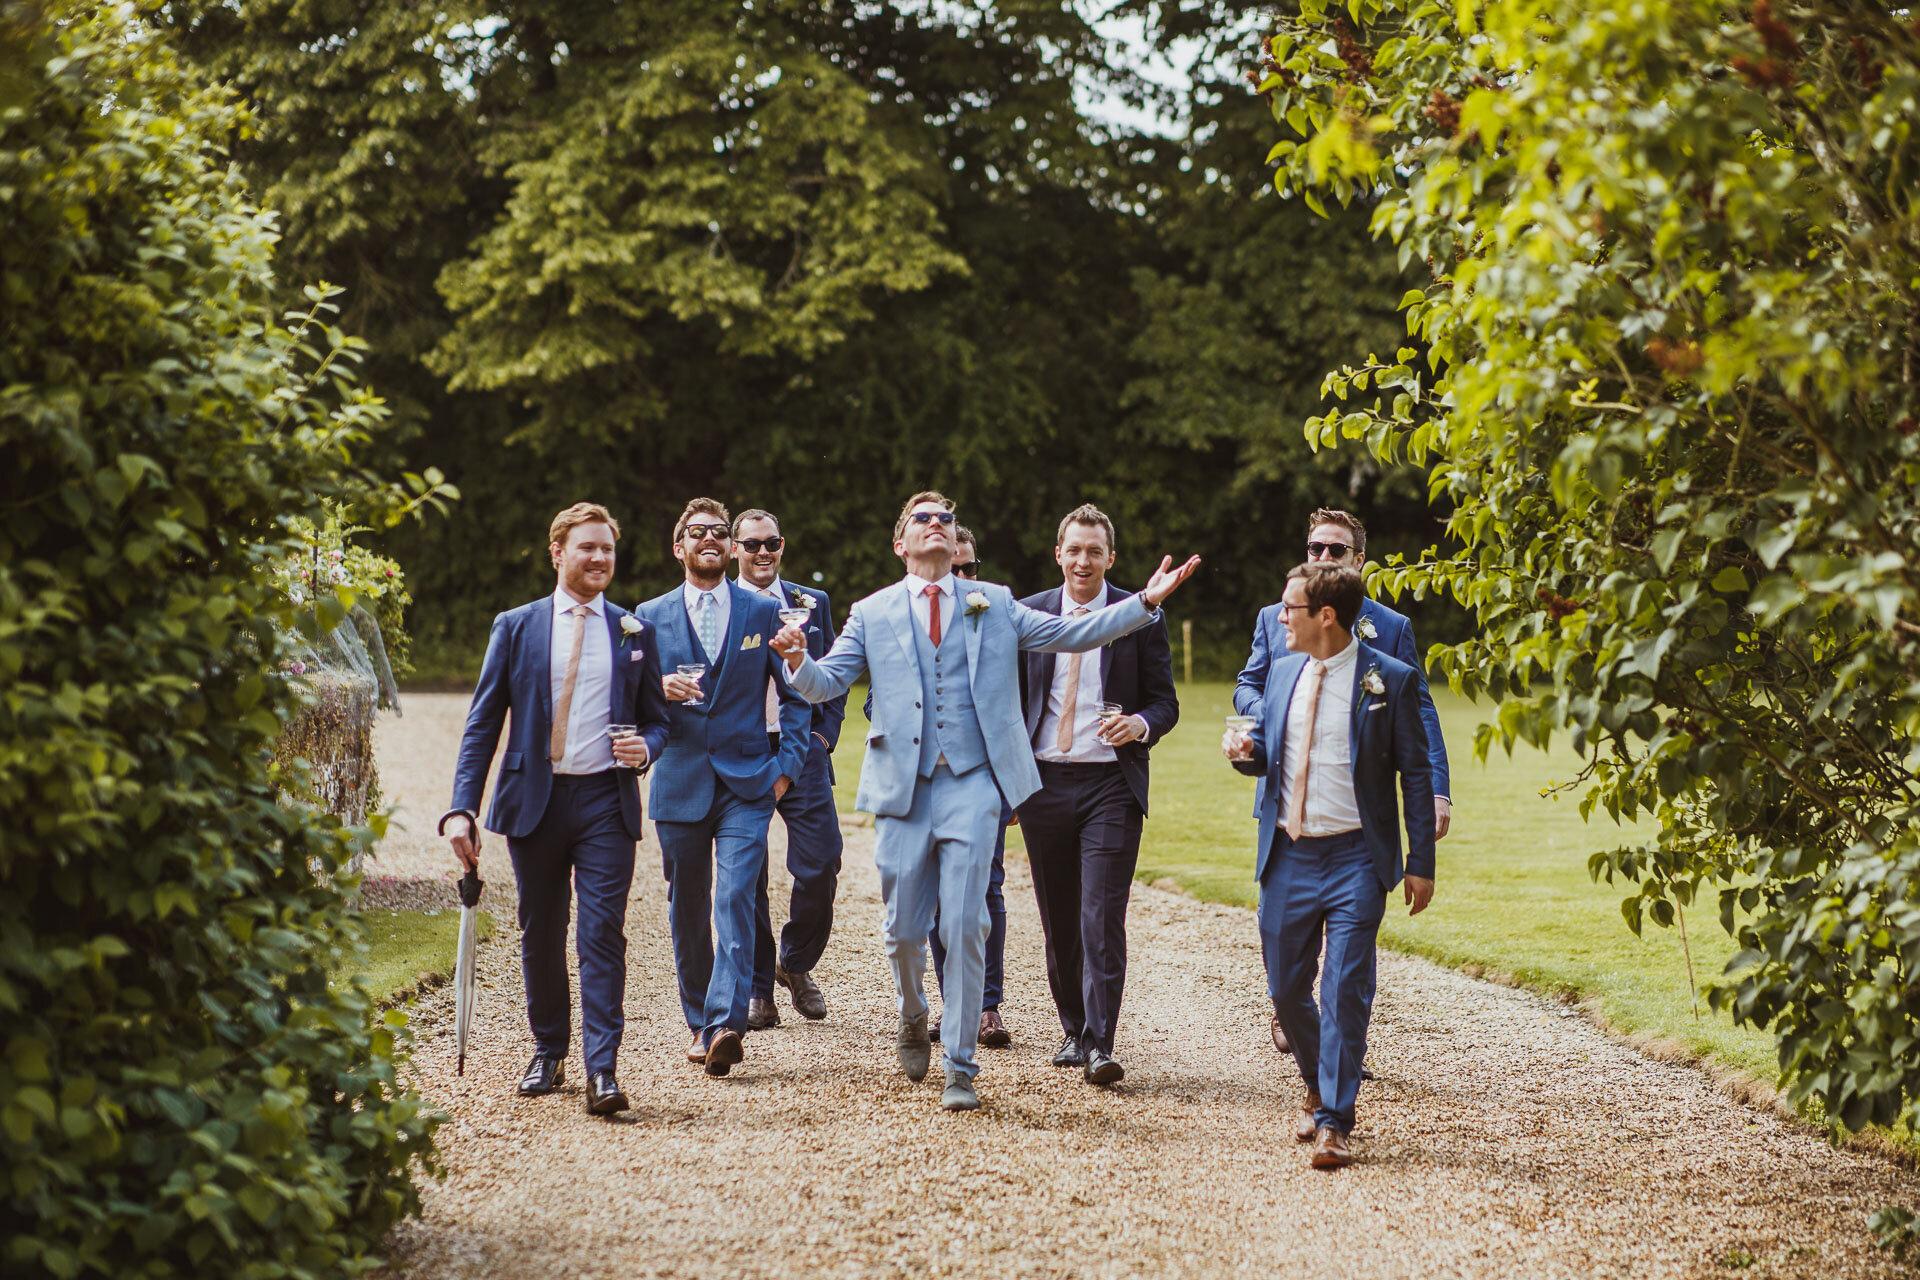 dorset_wedding_photographer-4.jpg